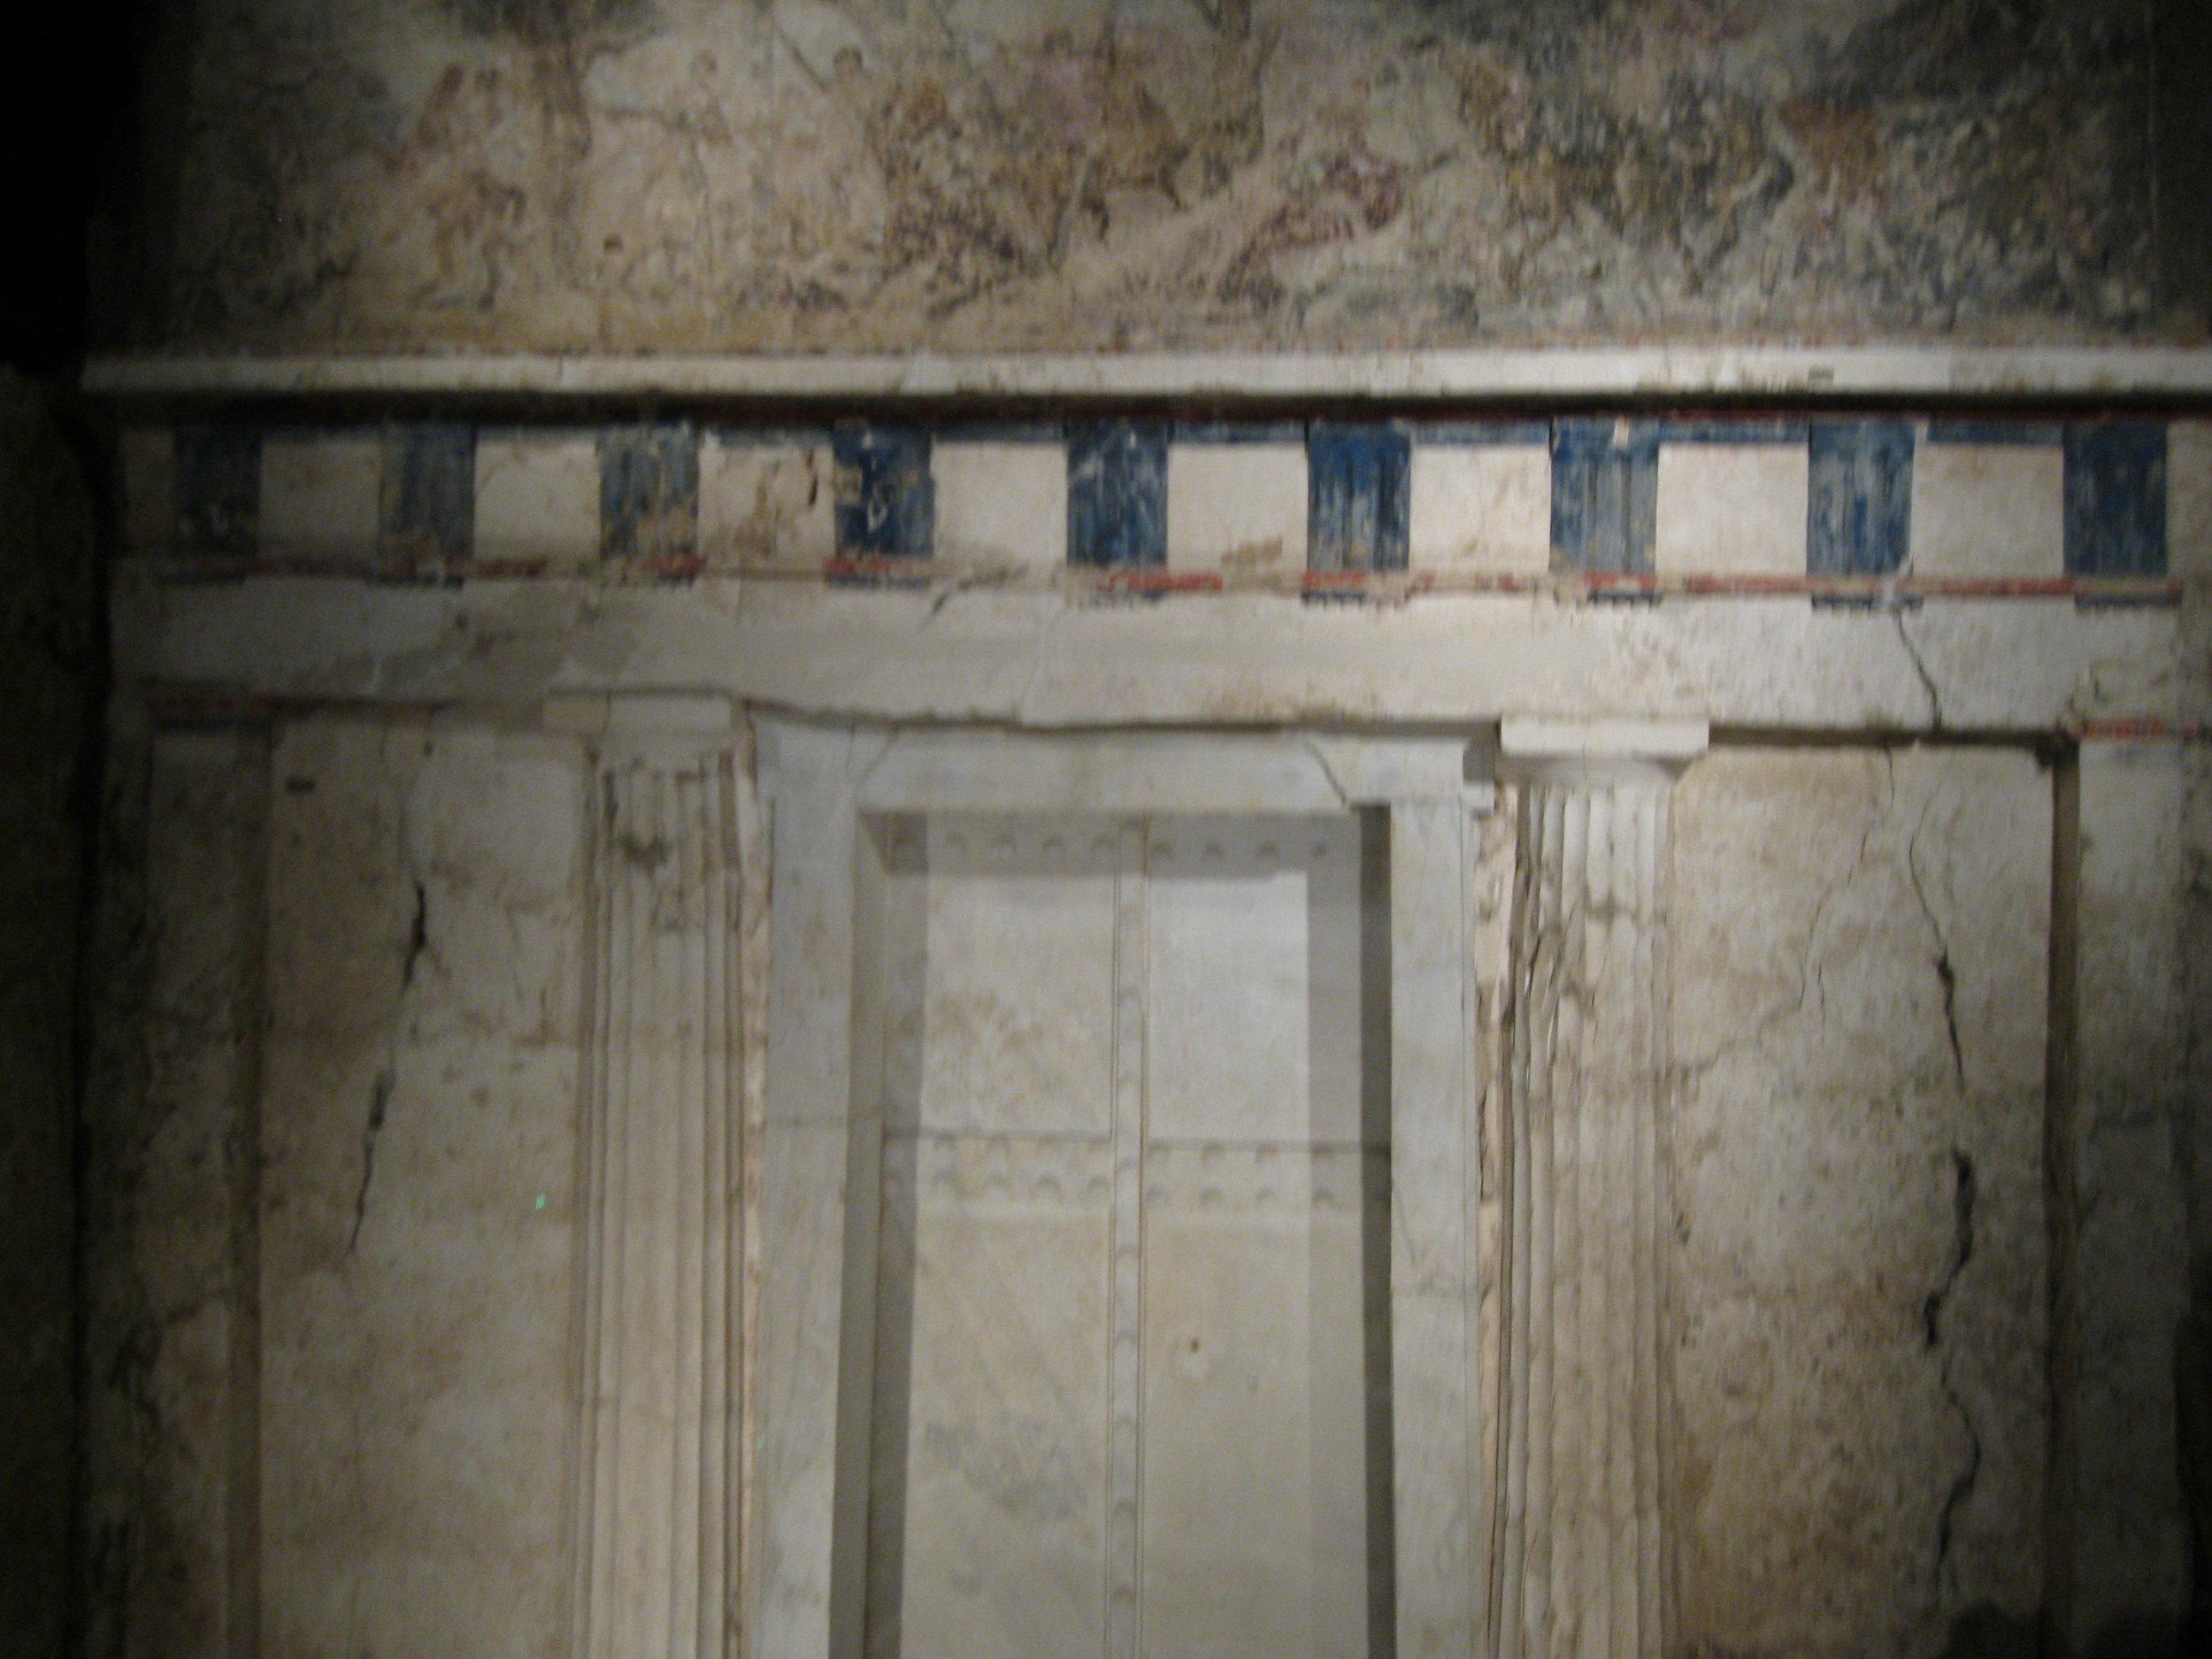 Entrance to Philip II's tomb